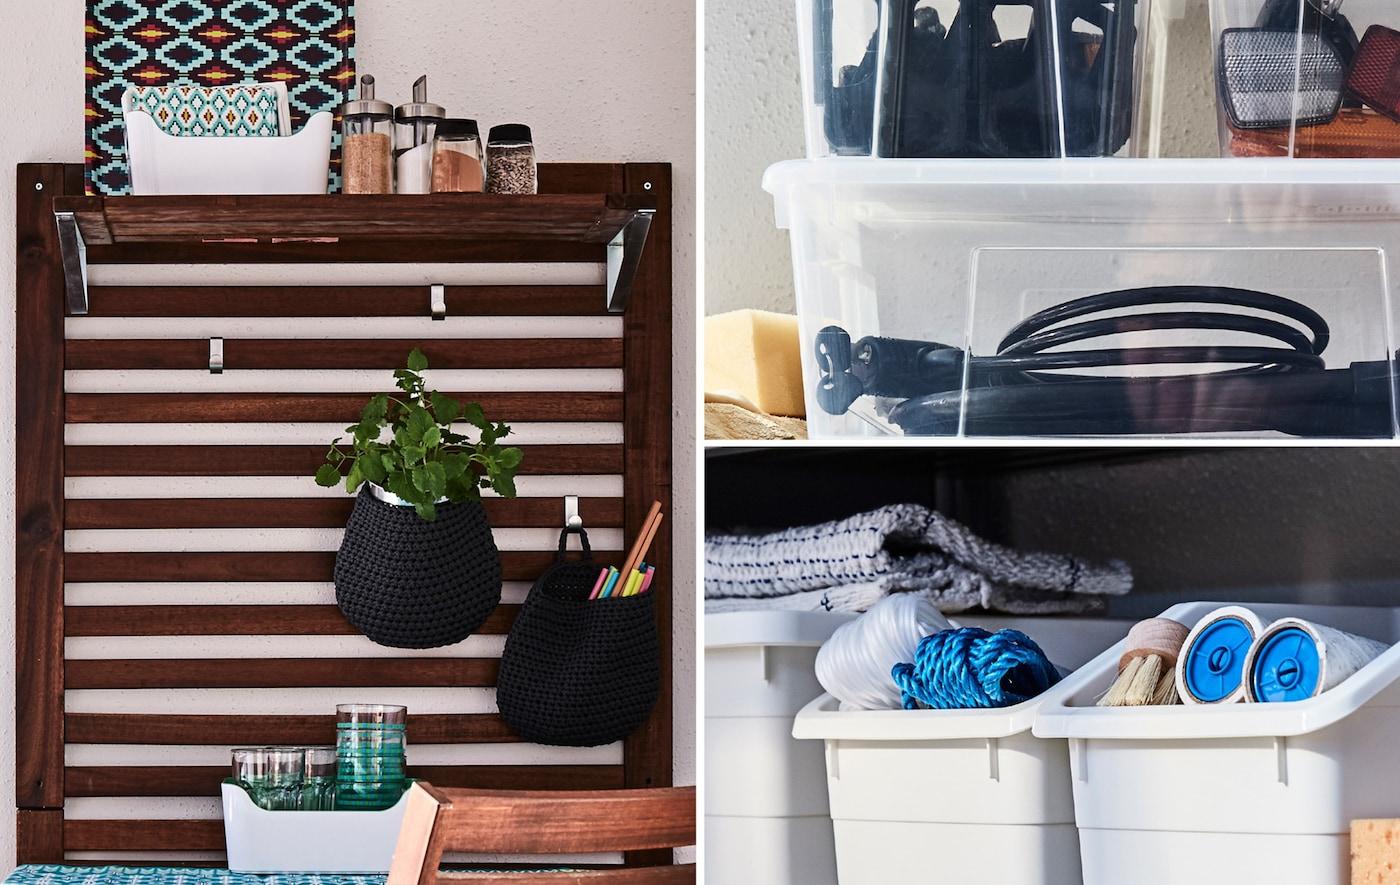 Outdoor storage and organising  Balcony ideas - IKEA